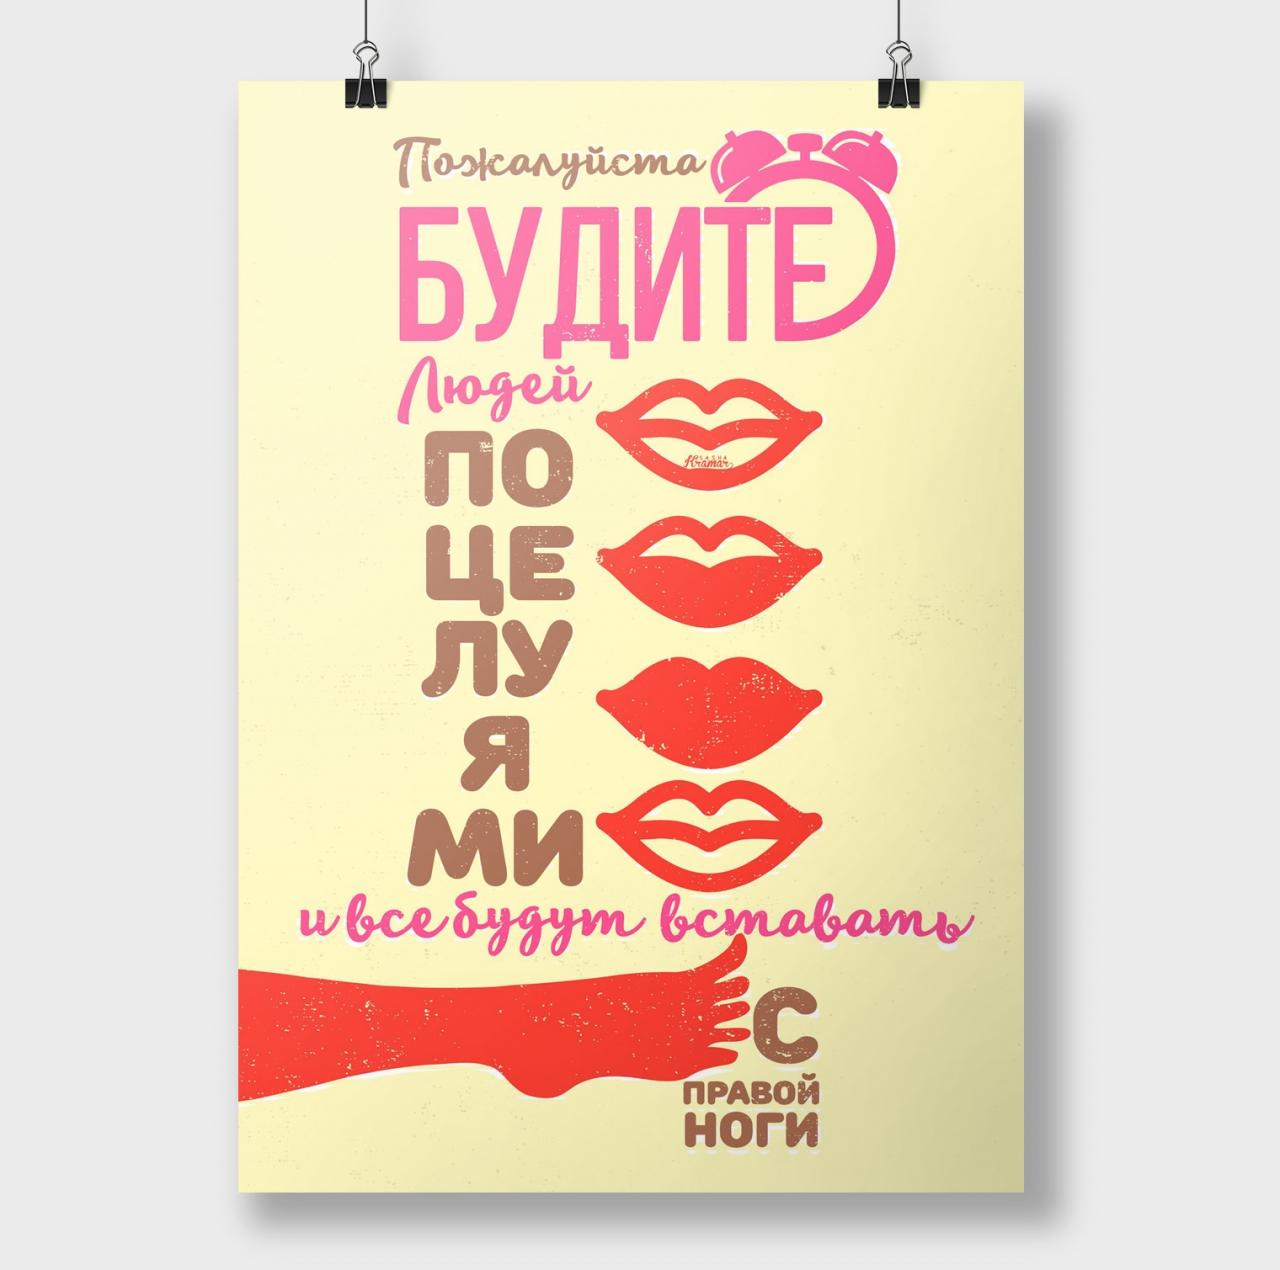 Будите людей поцелуями